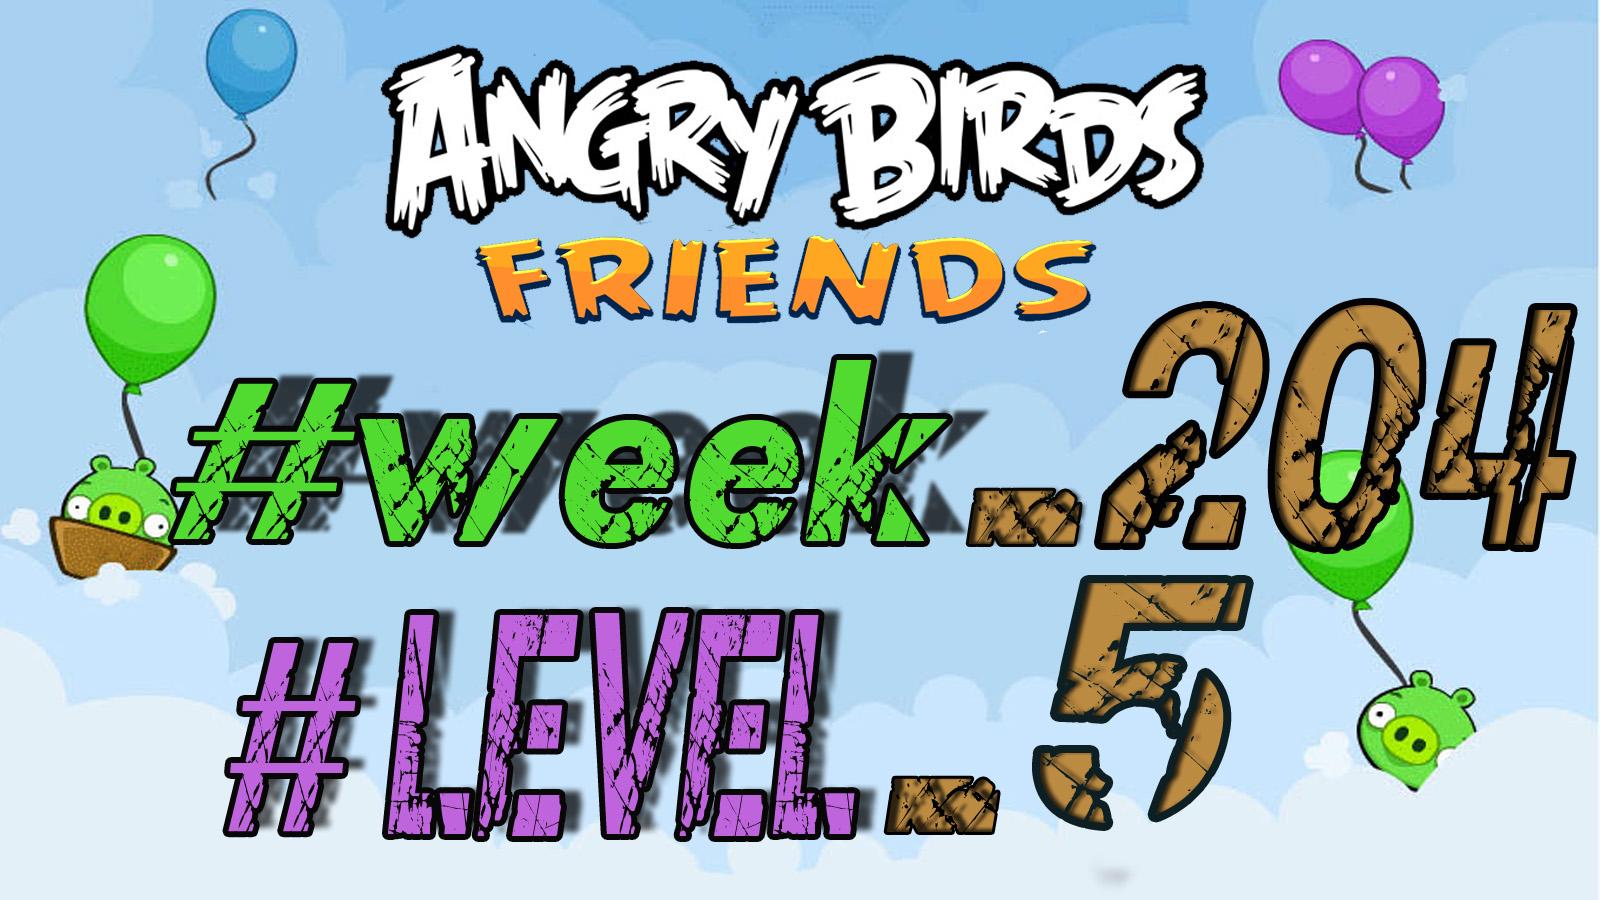 Angrybirds Francescanatale 05: Angry Birds Friends Tournament Week 204 Level 5 / 7abr 2016